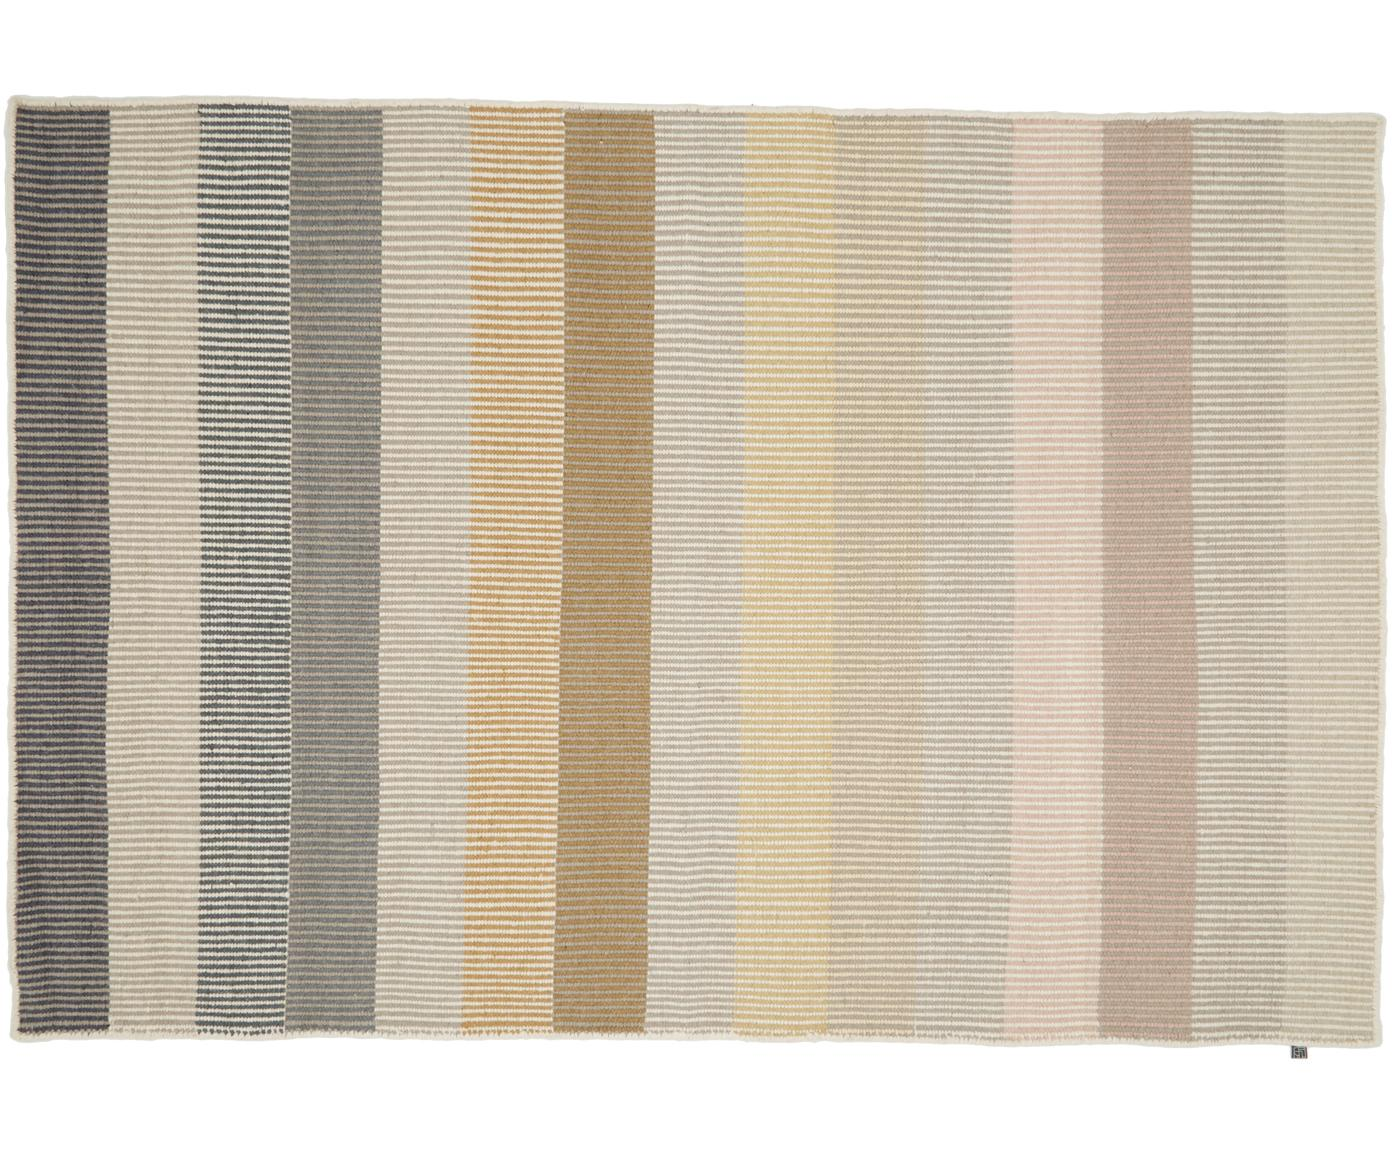 Alfombra kilim artesanal de lana Devise, Multicolor, An 140 x L 200 cm (Tamaño S)